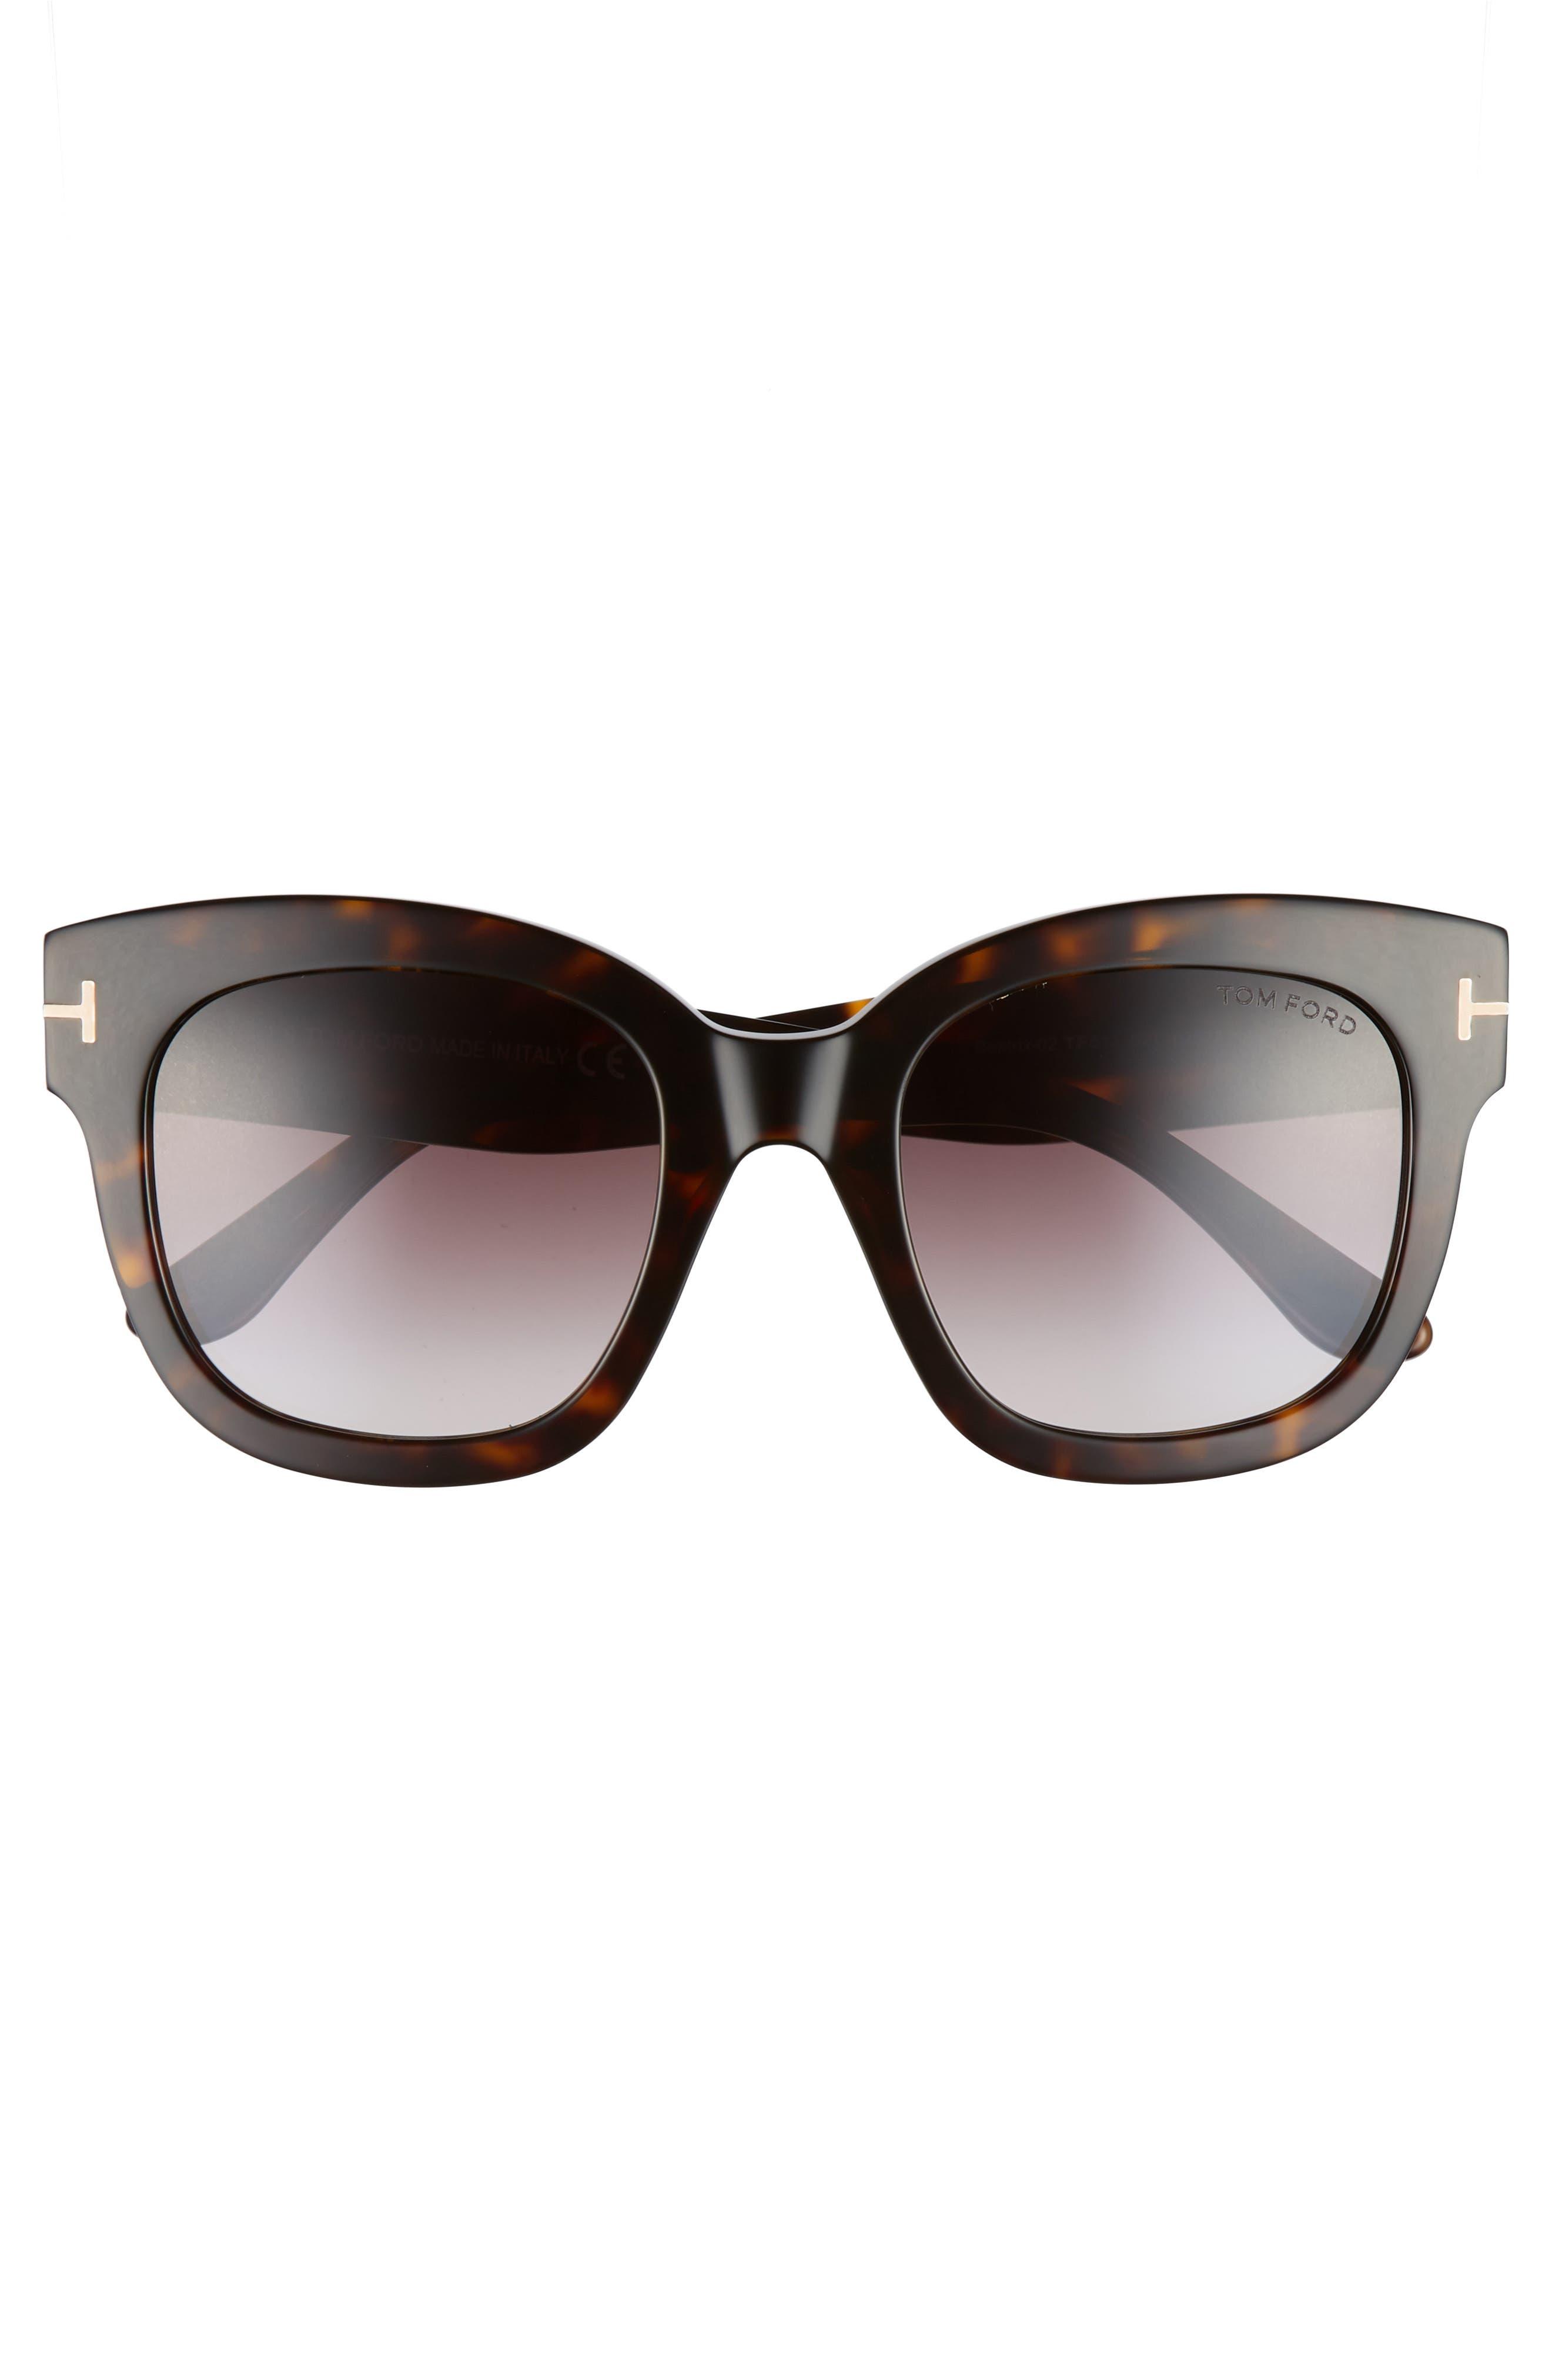 Beatrix 52mm Sunglasses,                             Alternate thumbnail 3, color,                             Dark Havana/ Gradient Bordeaux